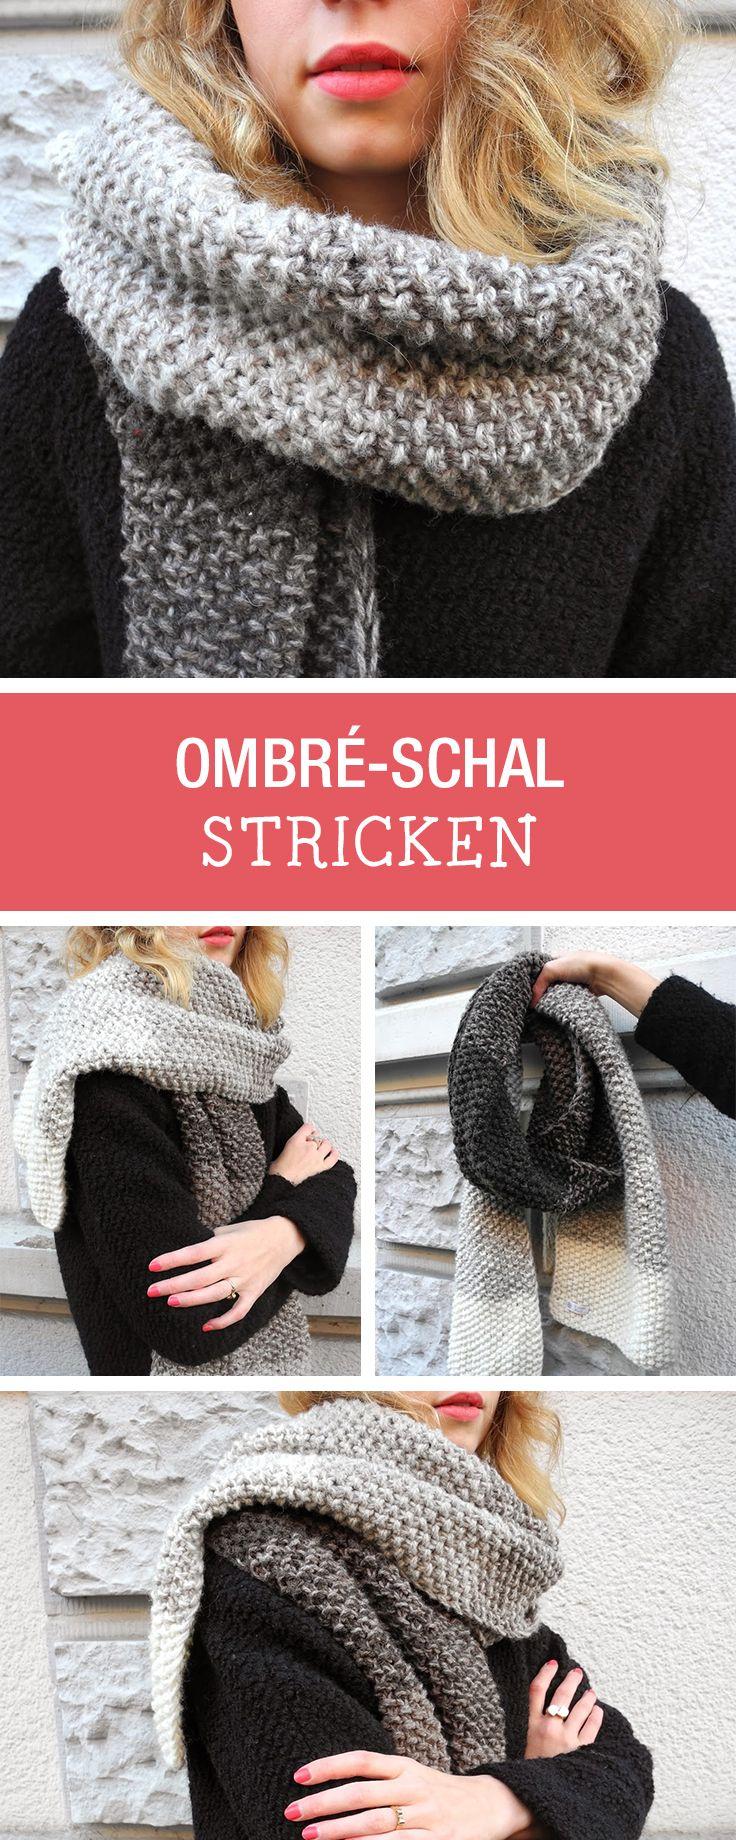 Strickanleitung für einen kuscheligen Schal, Mode stricken / knitting tutorial for an ombre scarf via DaWanda.com